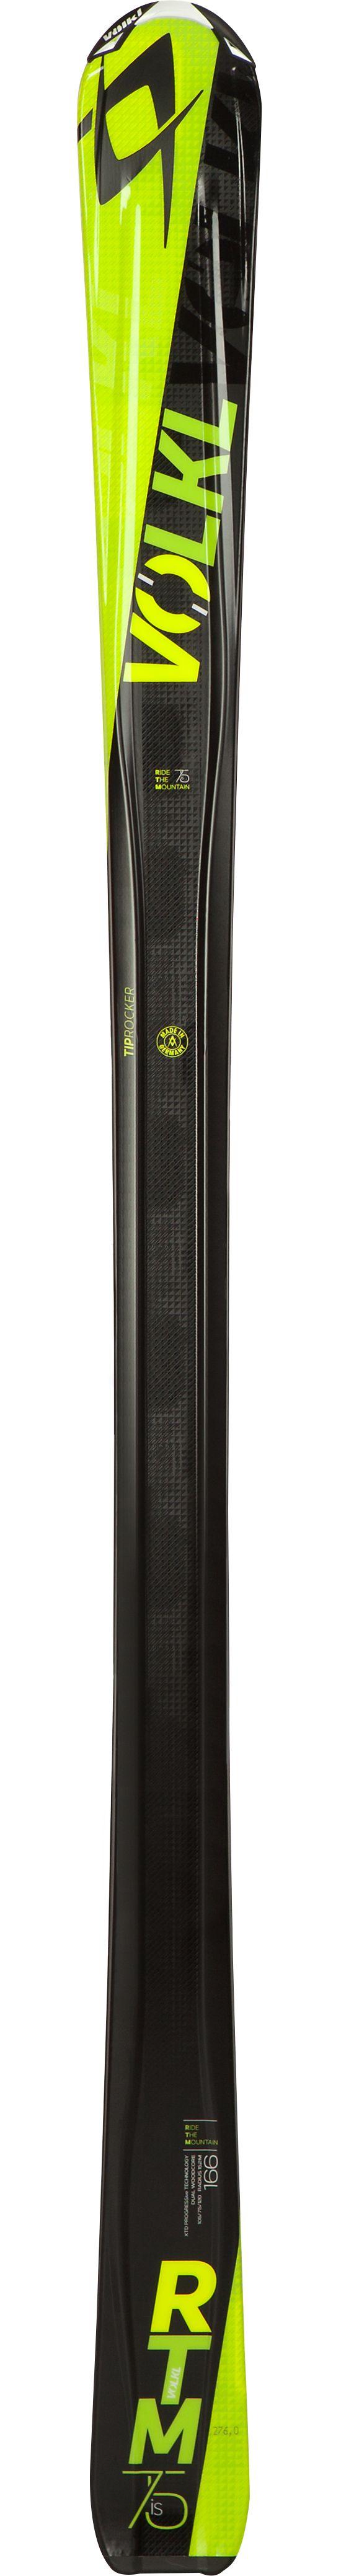 RTM 75IS BLACK/YELLOW 4M